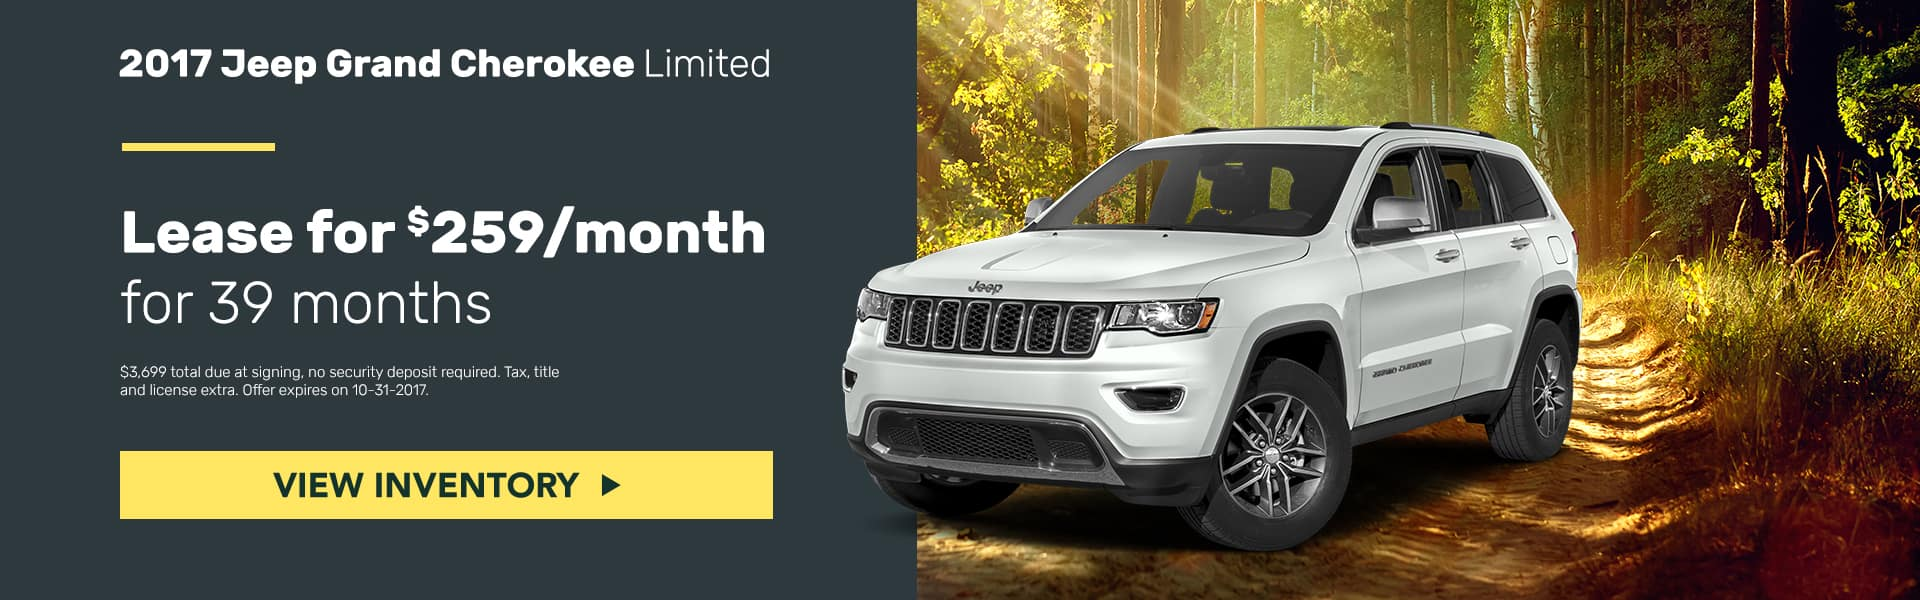 Jeep Grand Cherokee October Offer Mancari's